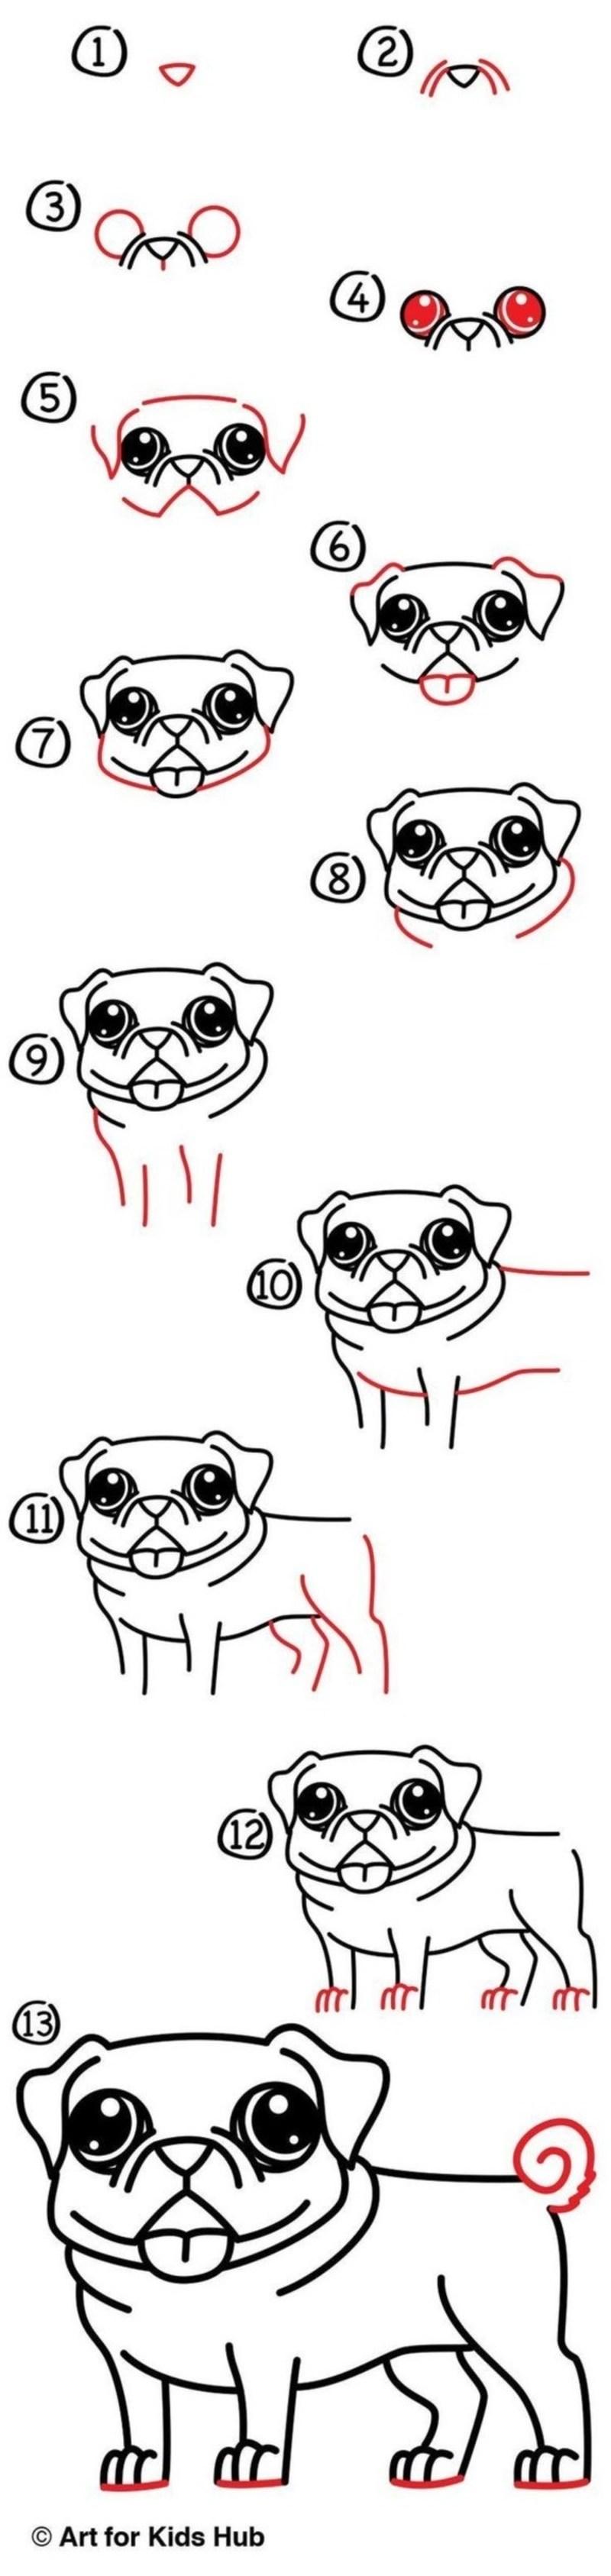 perros kawaii dibujos fáciles paso a paso a lápiz pug